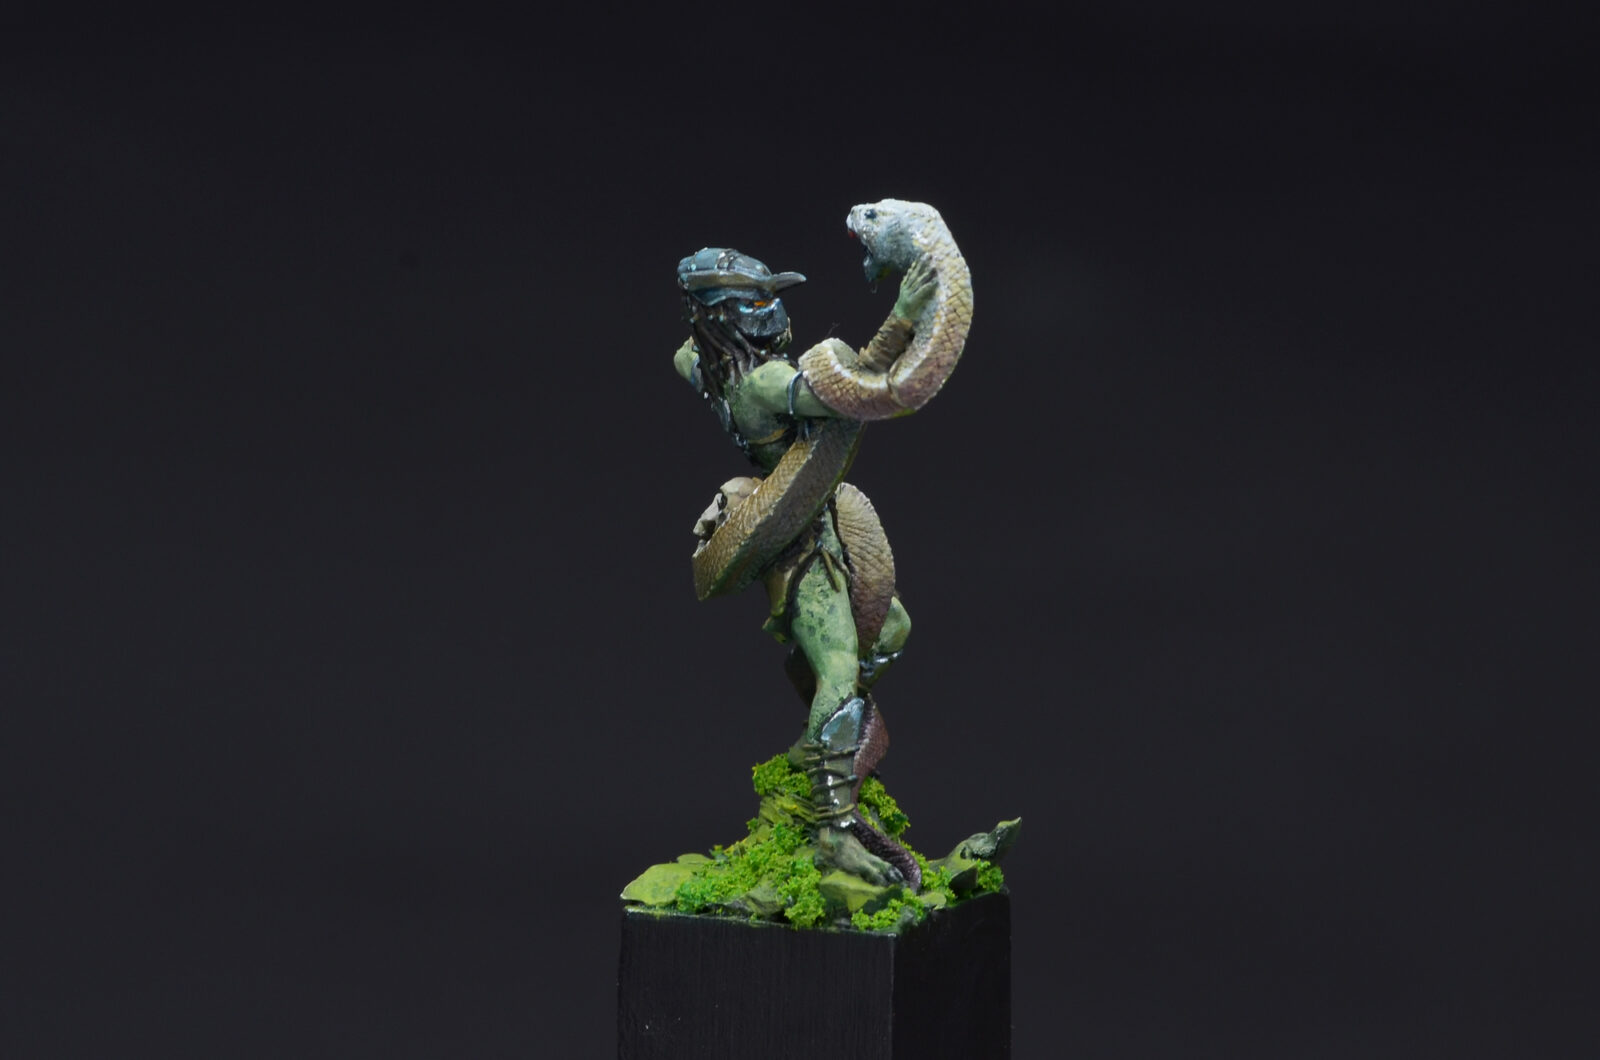 Predator05